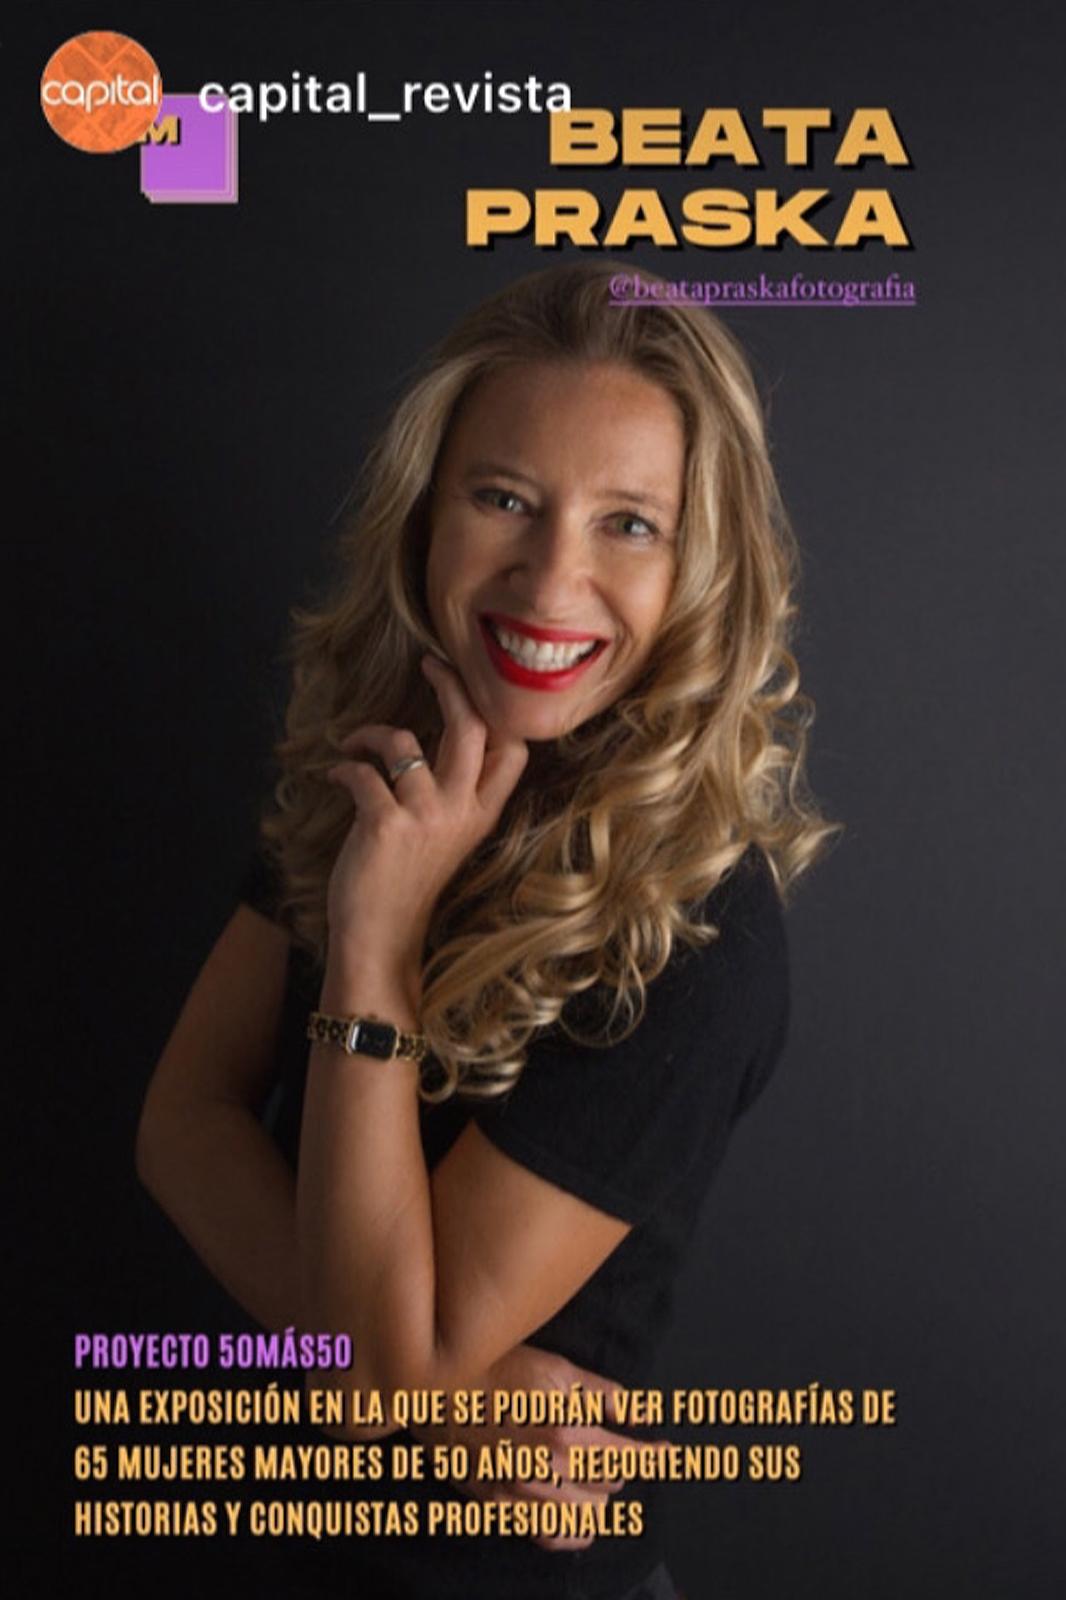 capital revista con Beata Praska Fotografia